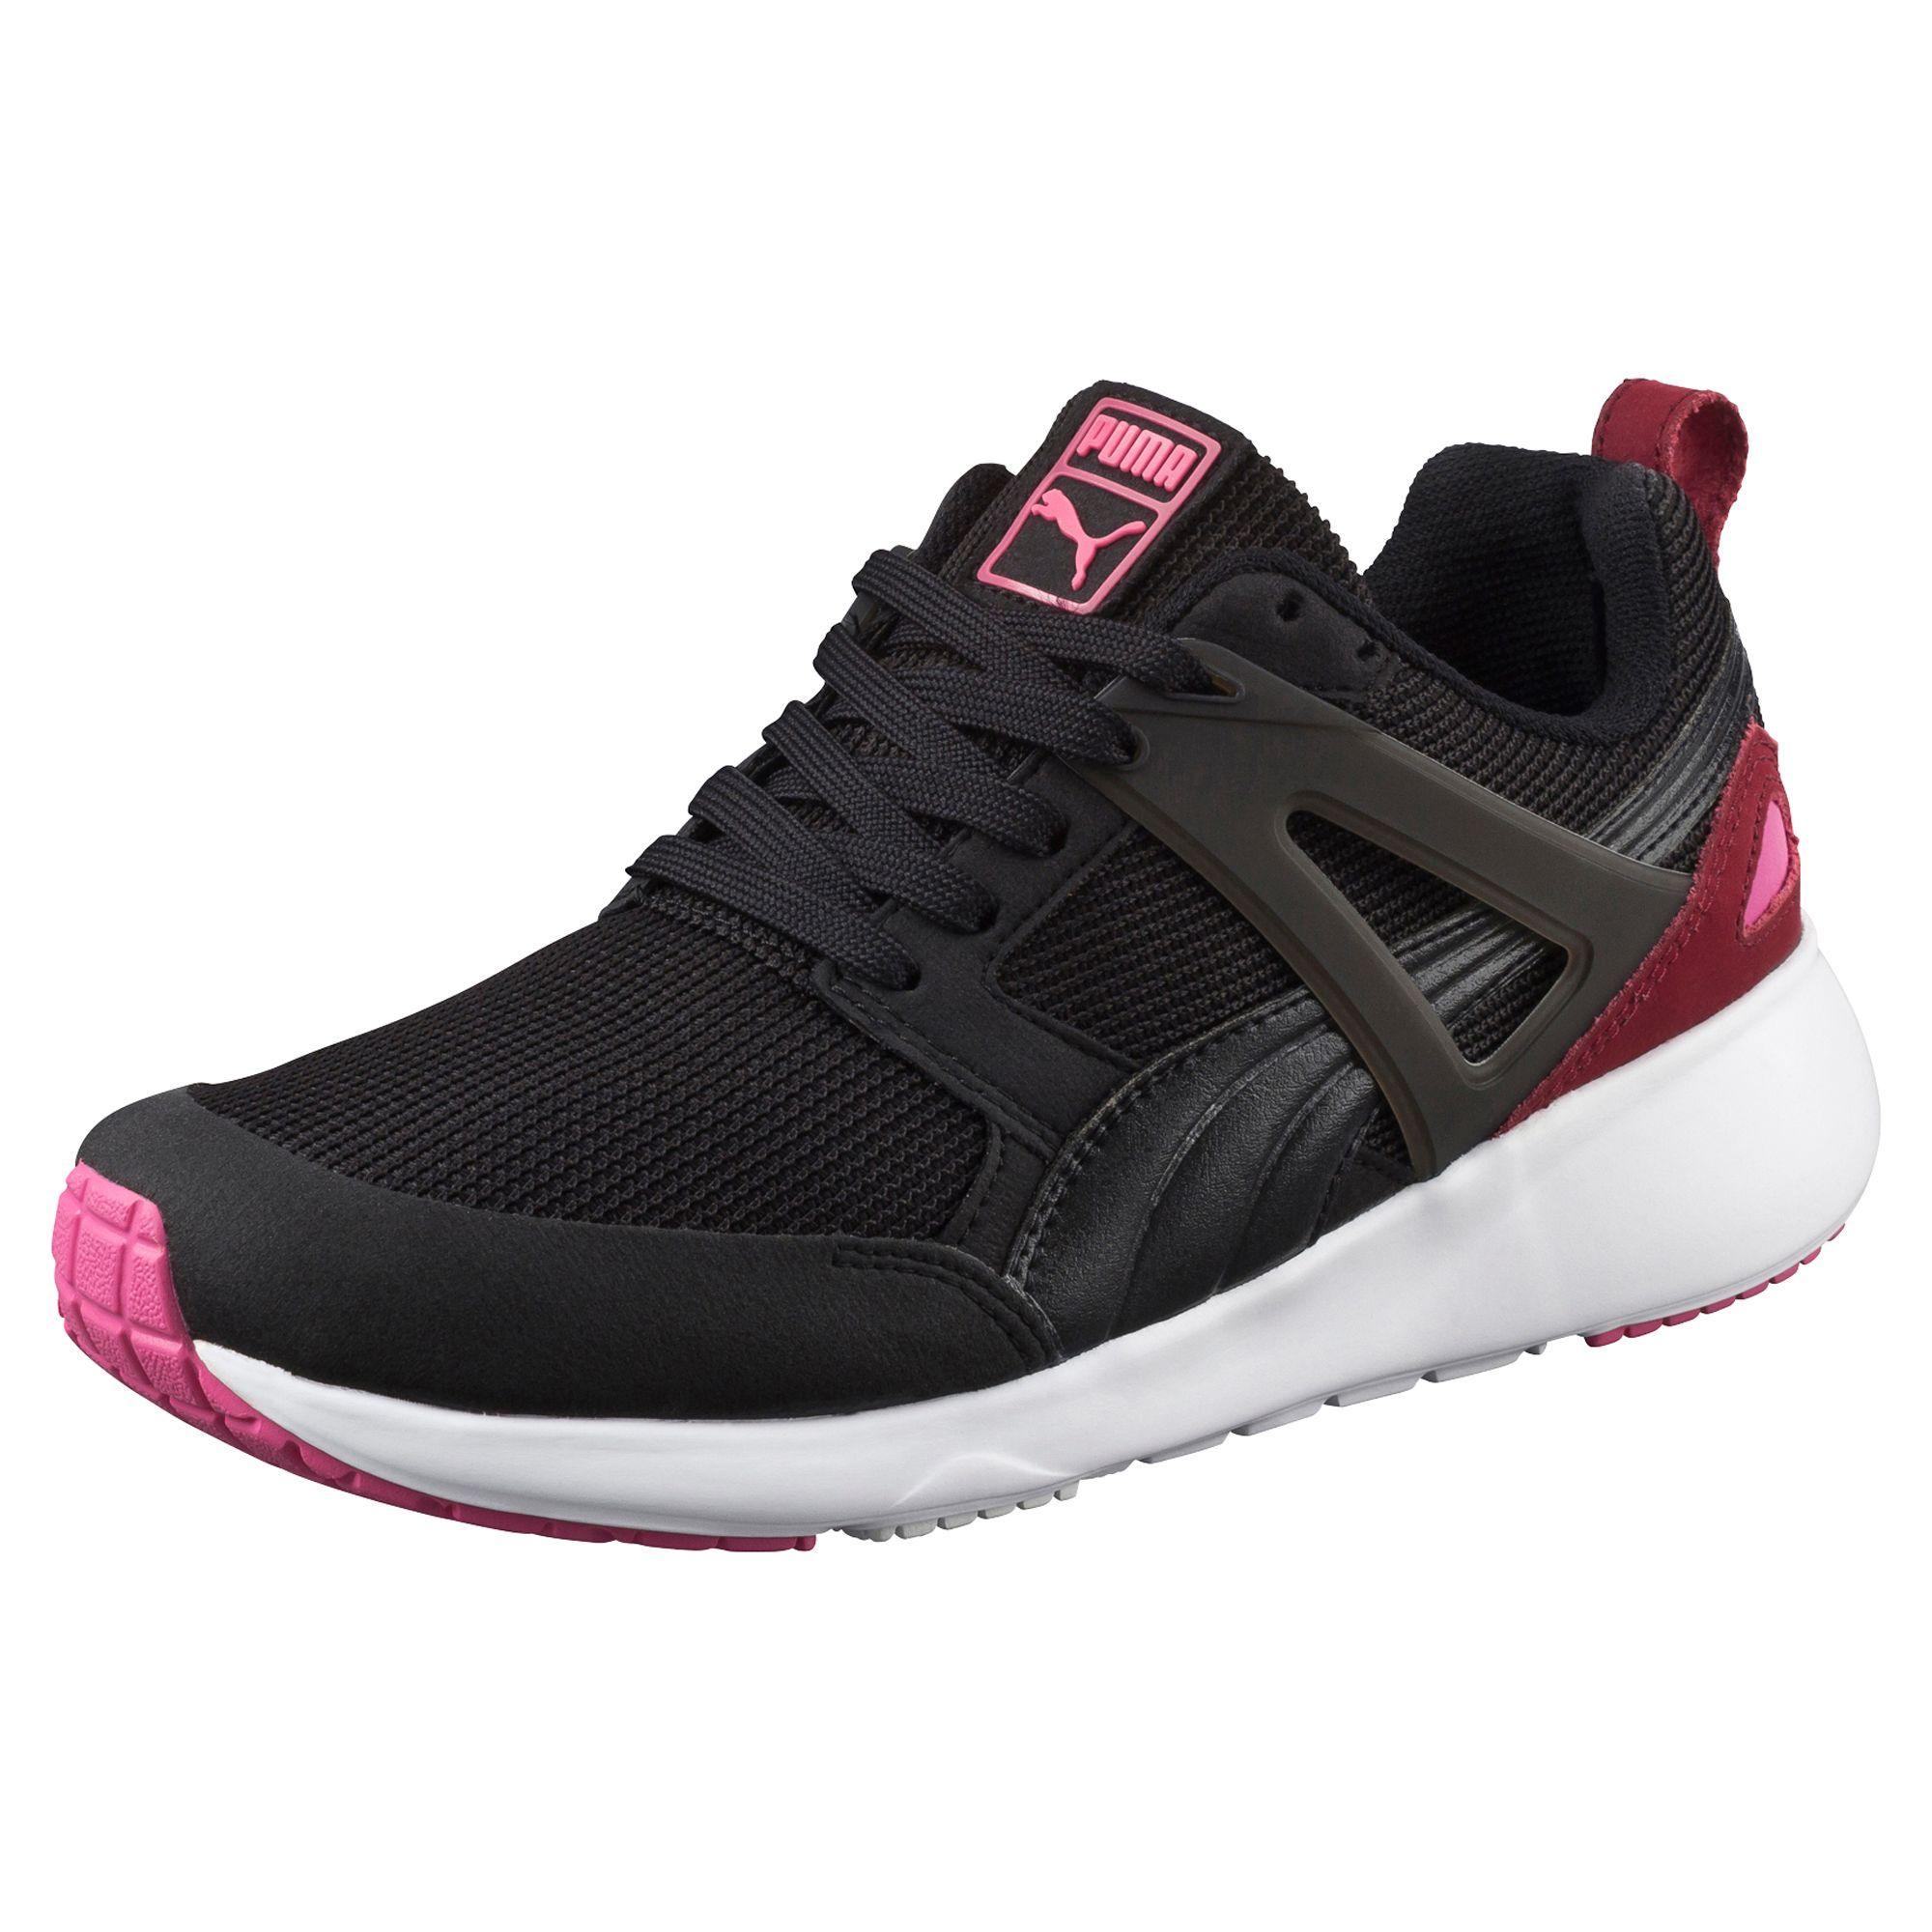 puma aril basic sports sneaker schuhe sneakers evolution. Black Bedroom Furniture Sets. Home Design Ideas